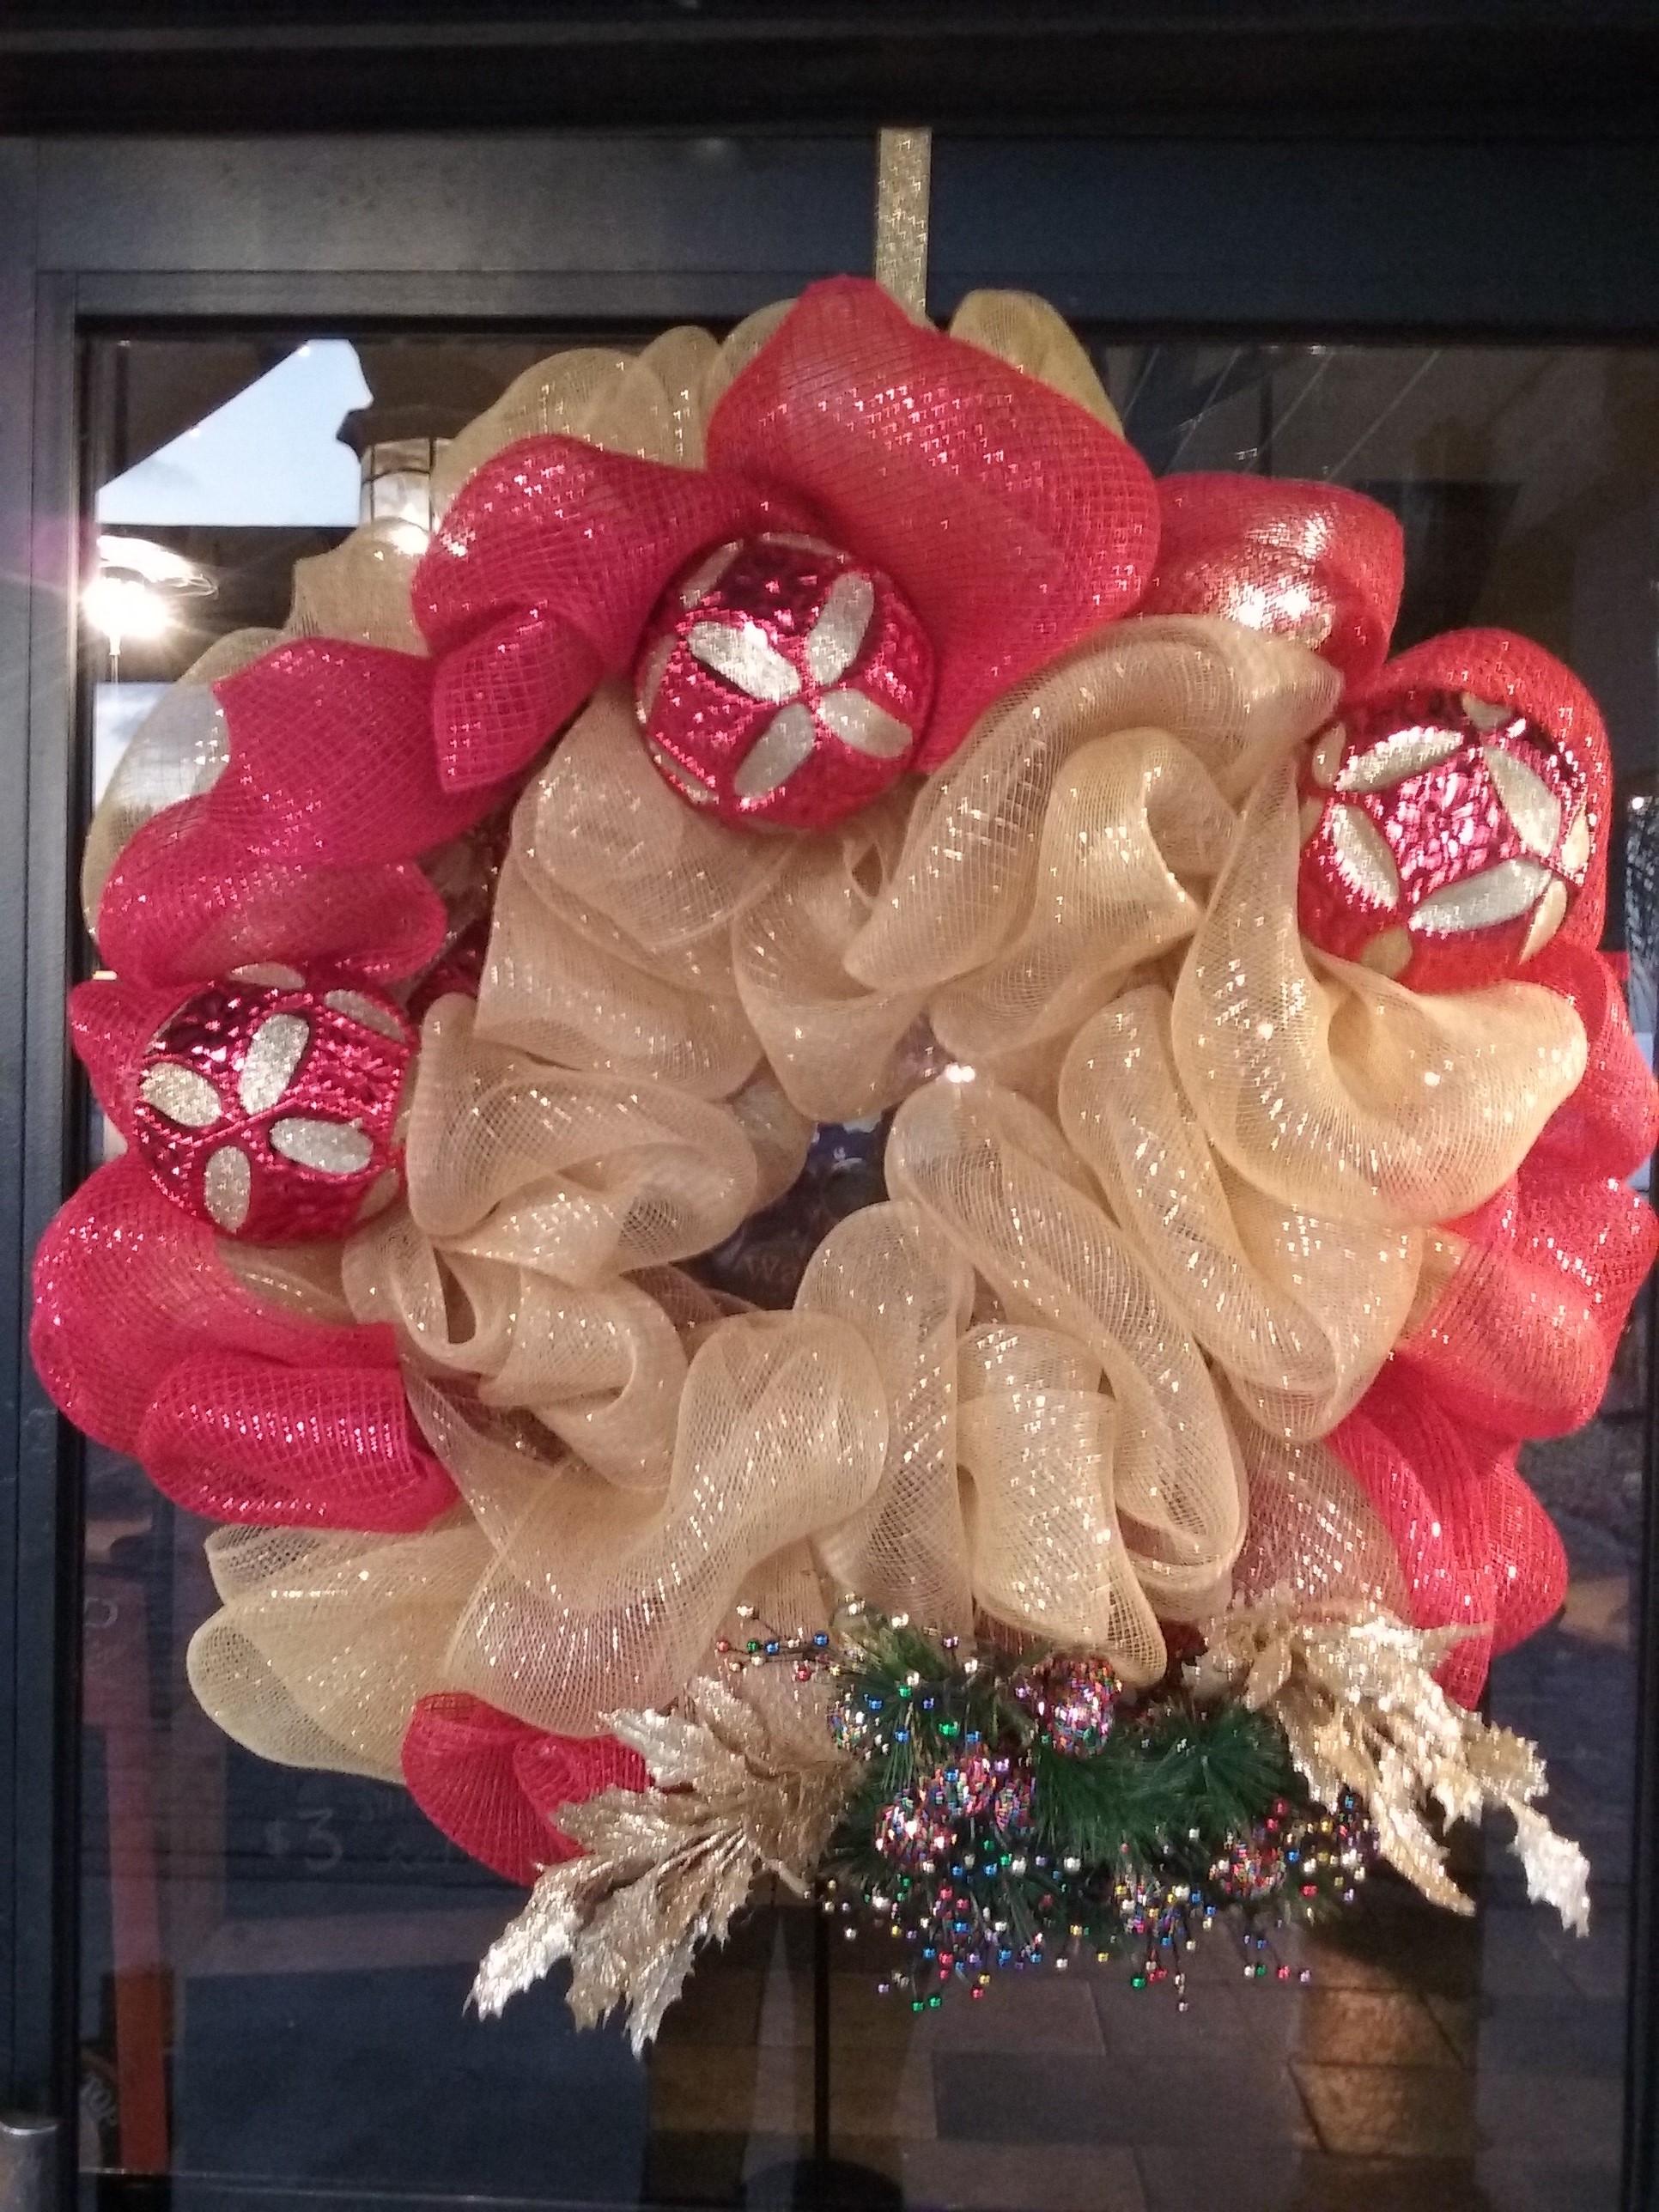 Gorgeous Christmas wreath for us!